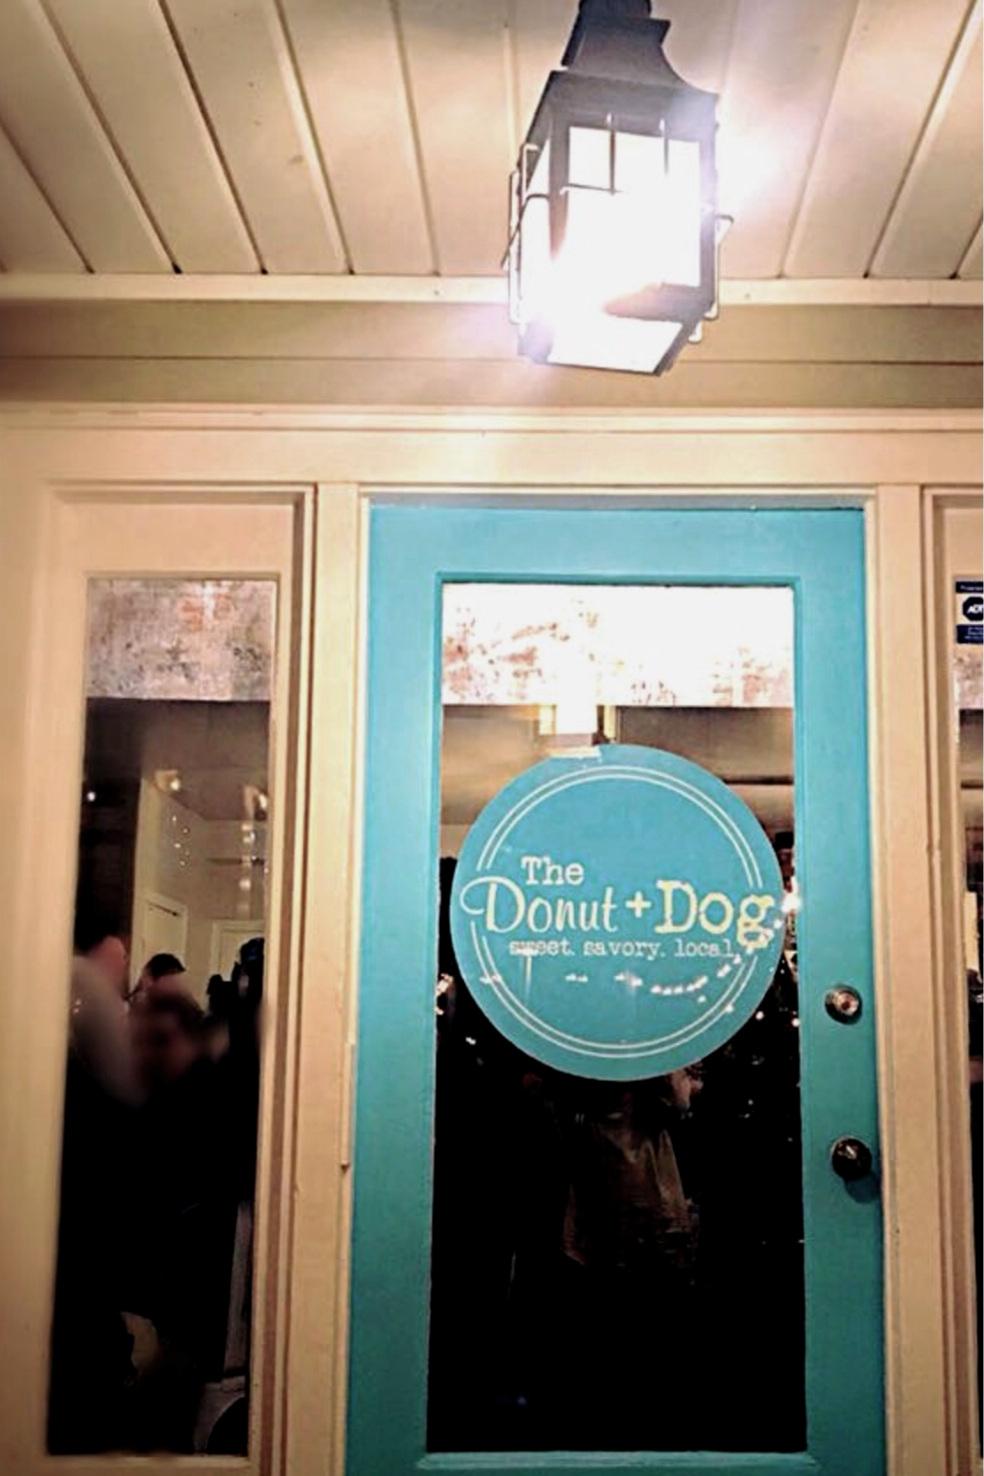 The Donut + Dog Restaurant